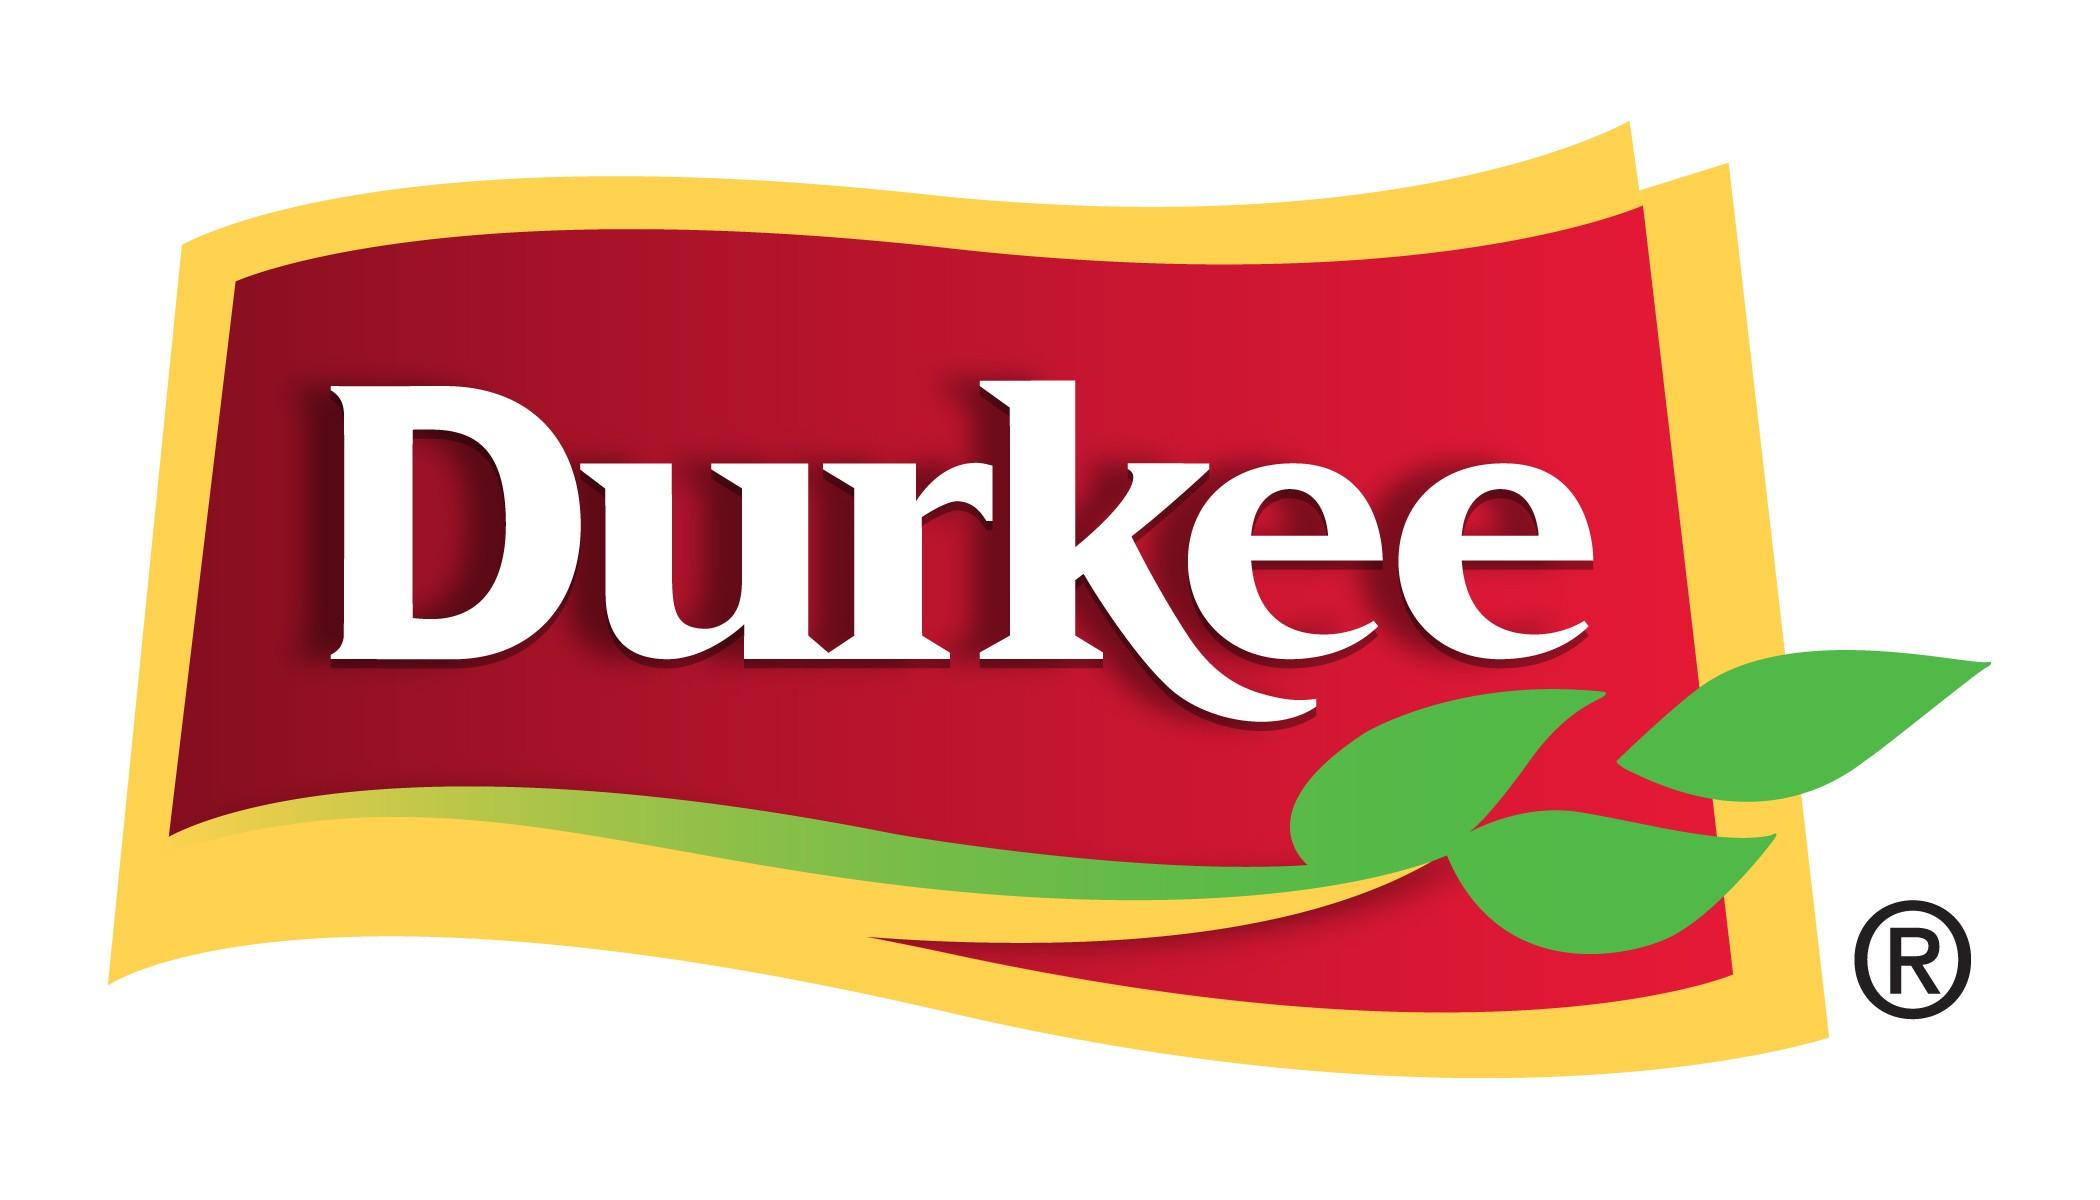 durkee_logo.jpg